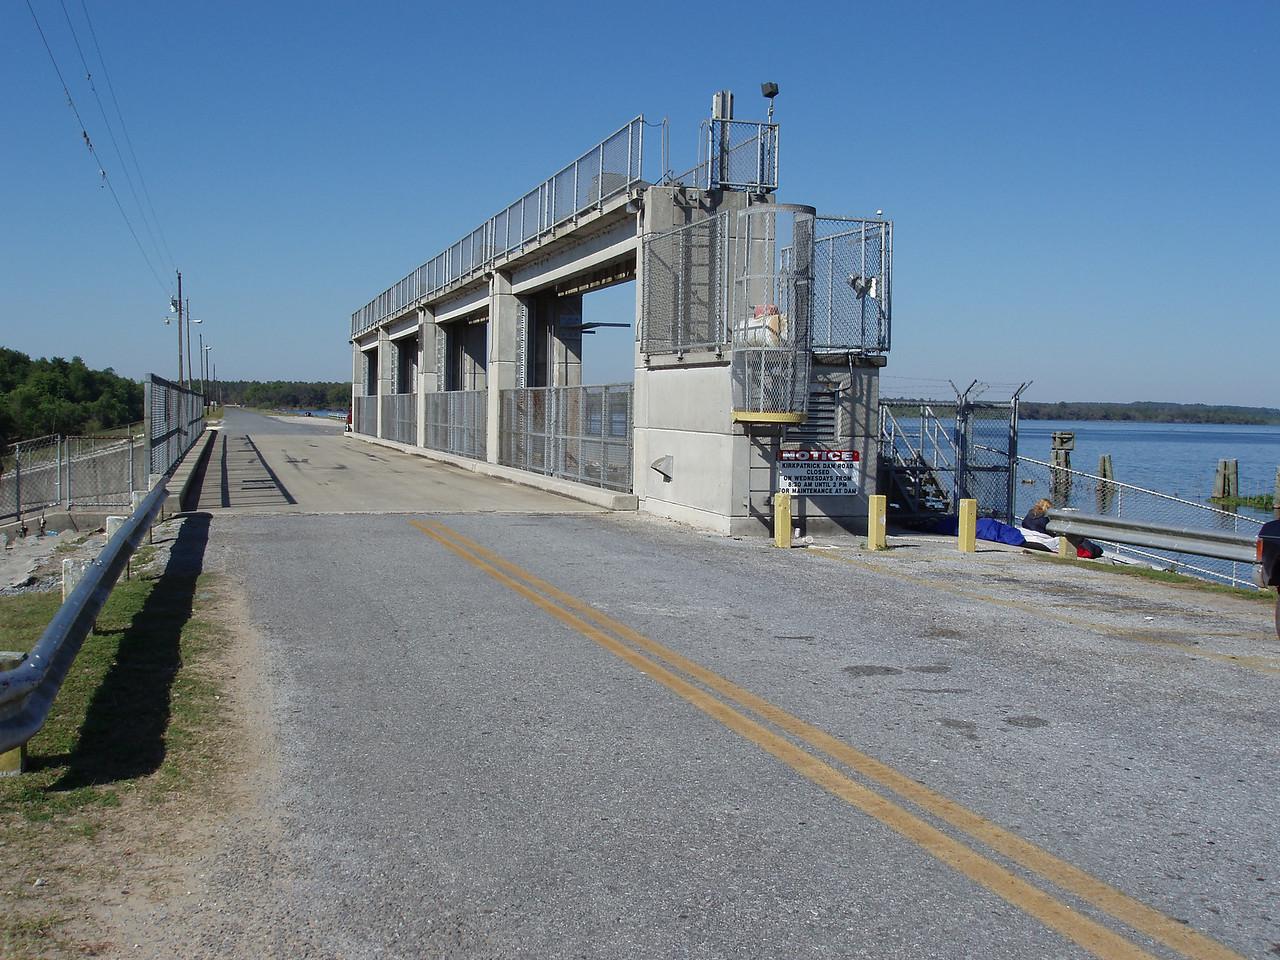 Kirkpatrick Dam at Rodman<br /> photo credit: Robert Coveney / Florida Trail Association